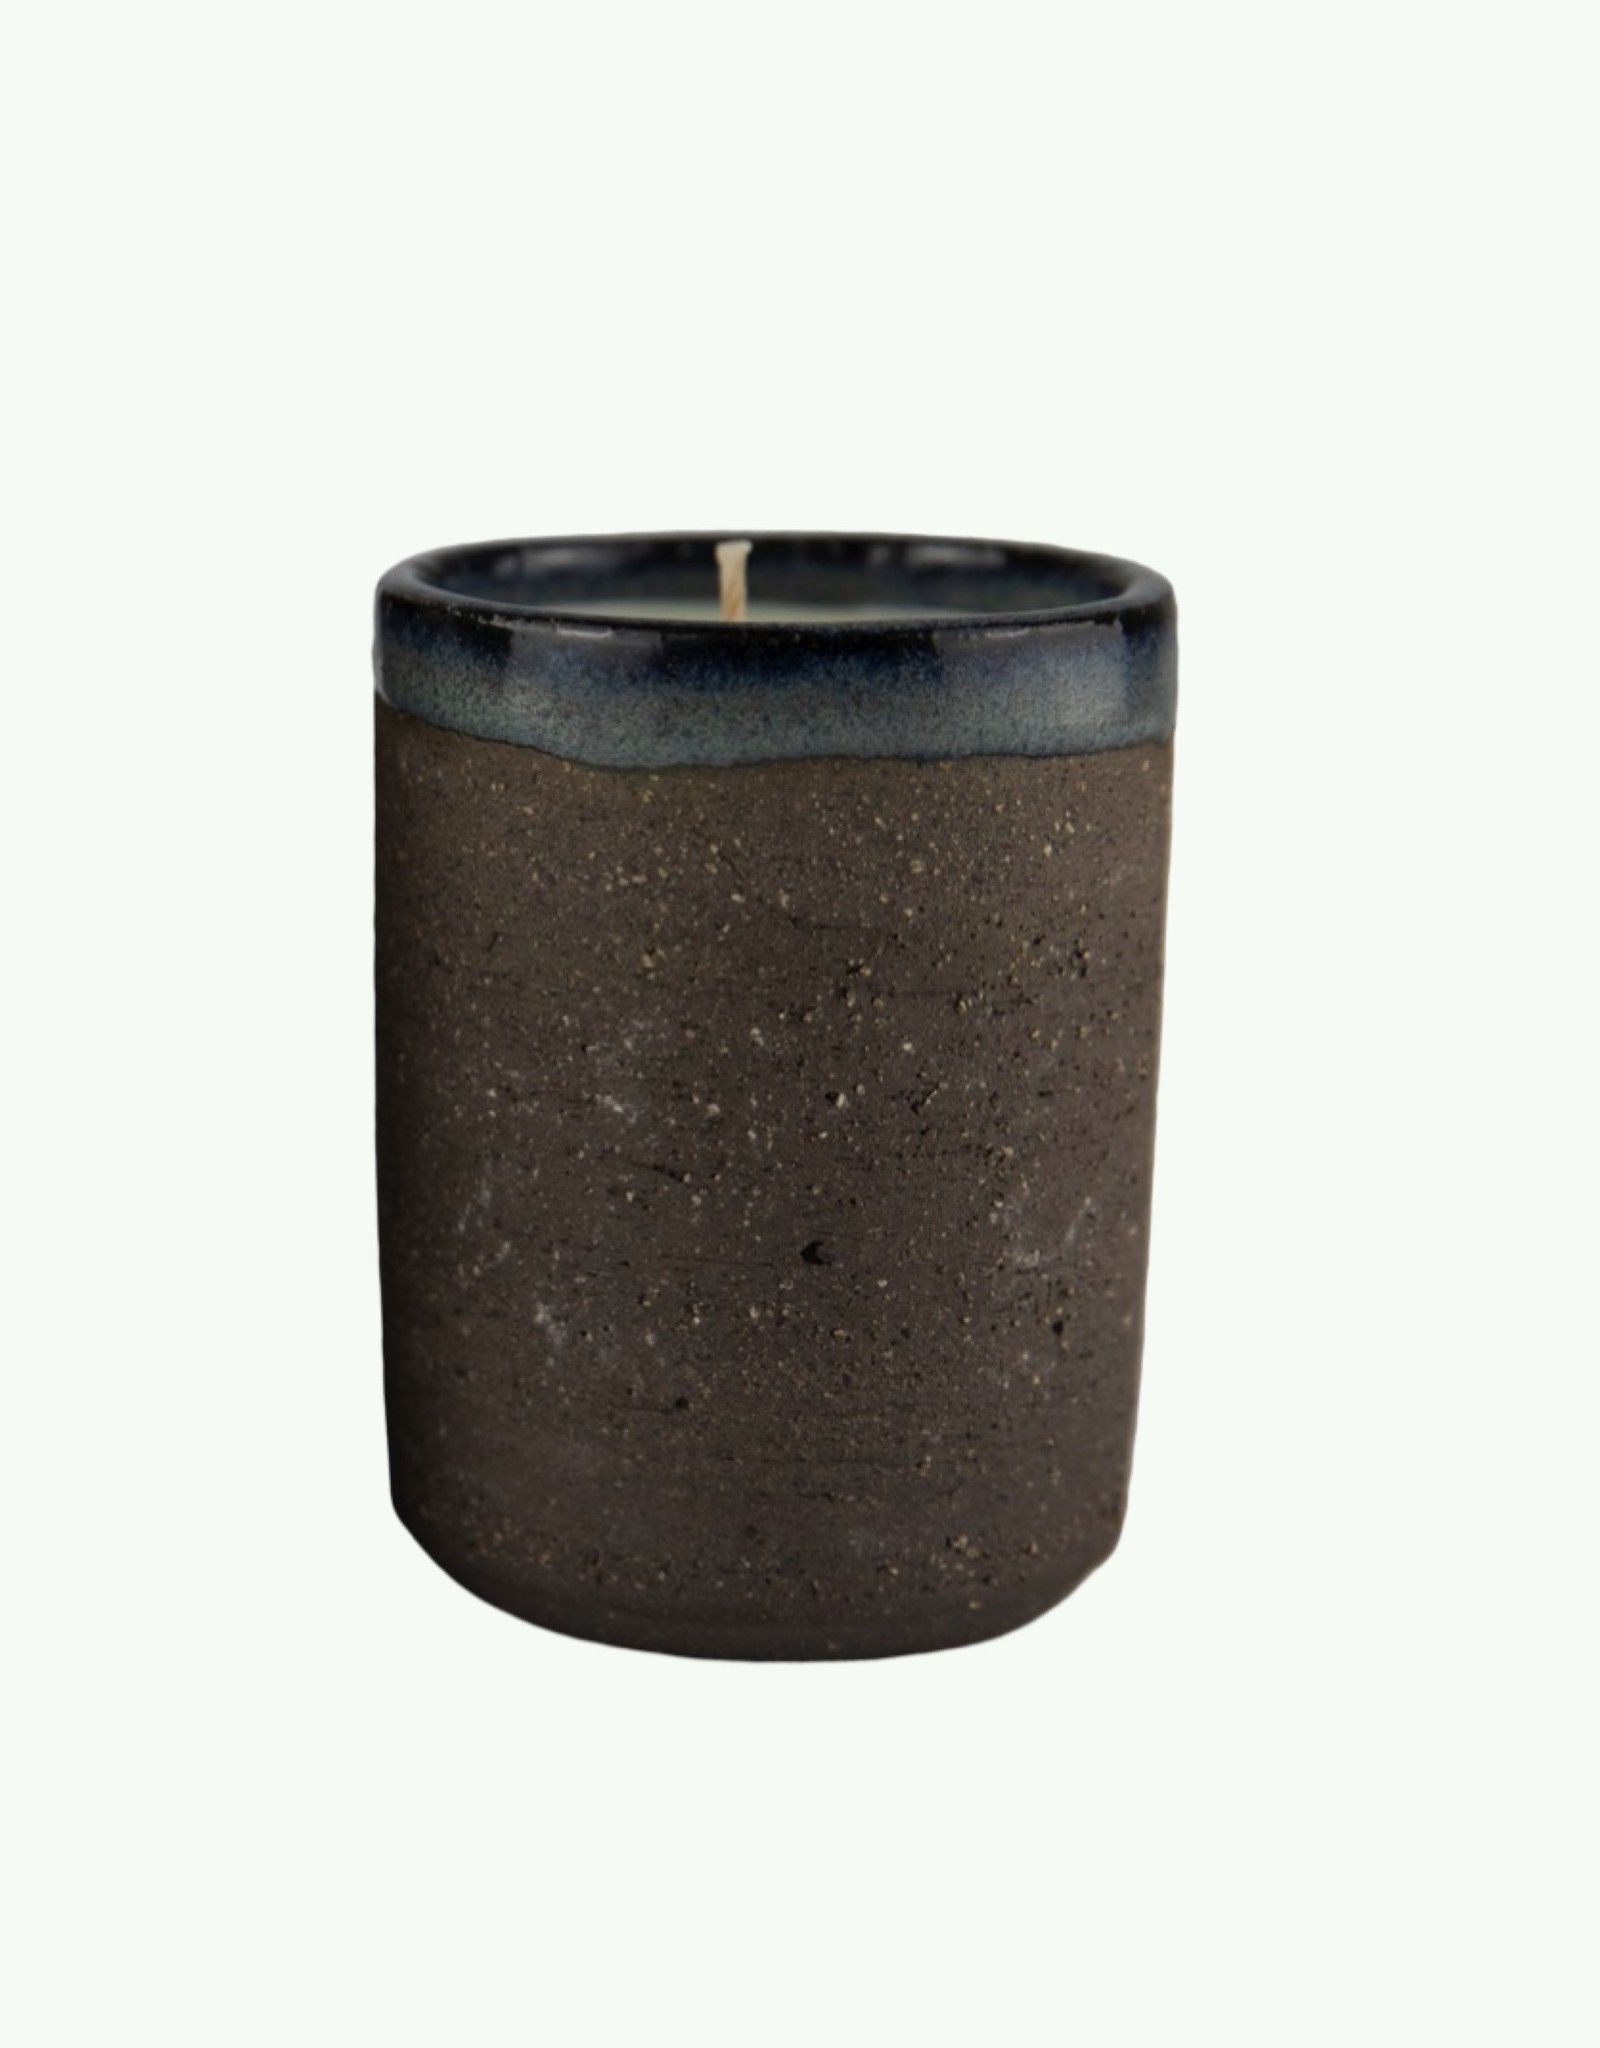 Aer AER - At Dusk - Bougie Parfumée 125 ml